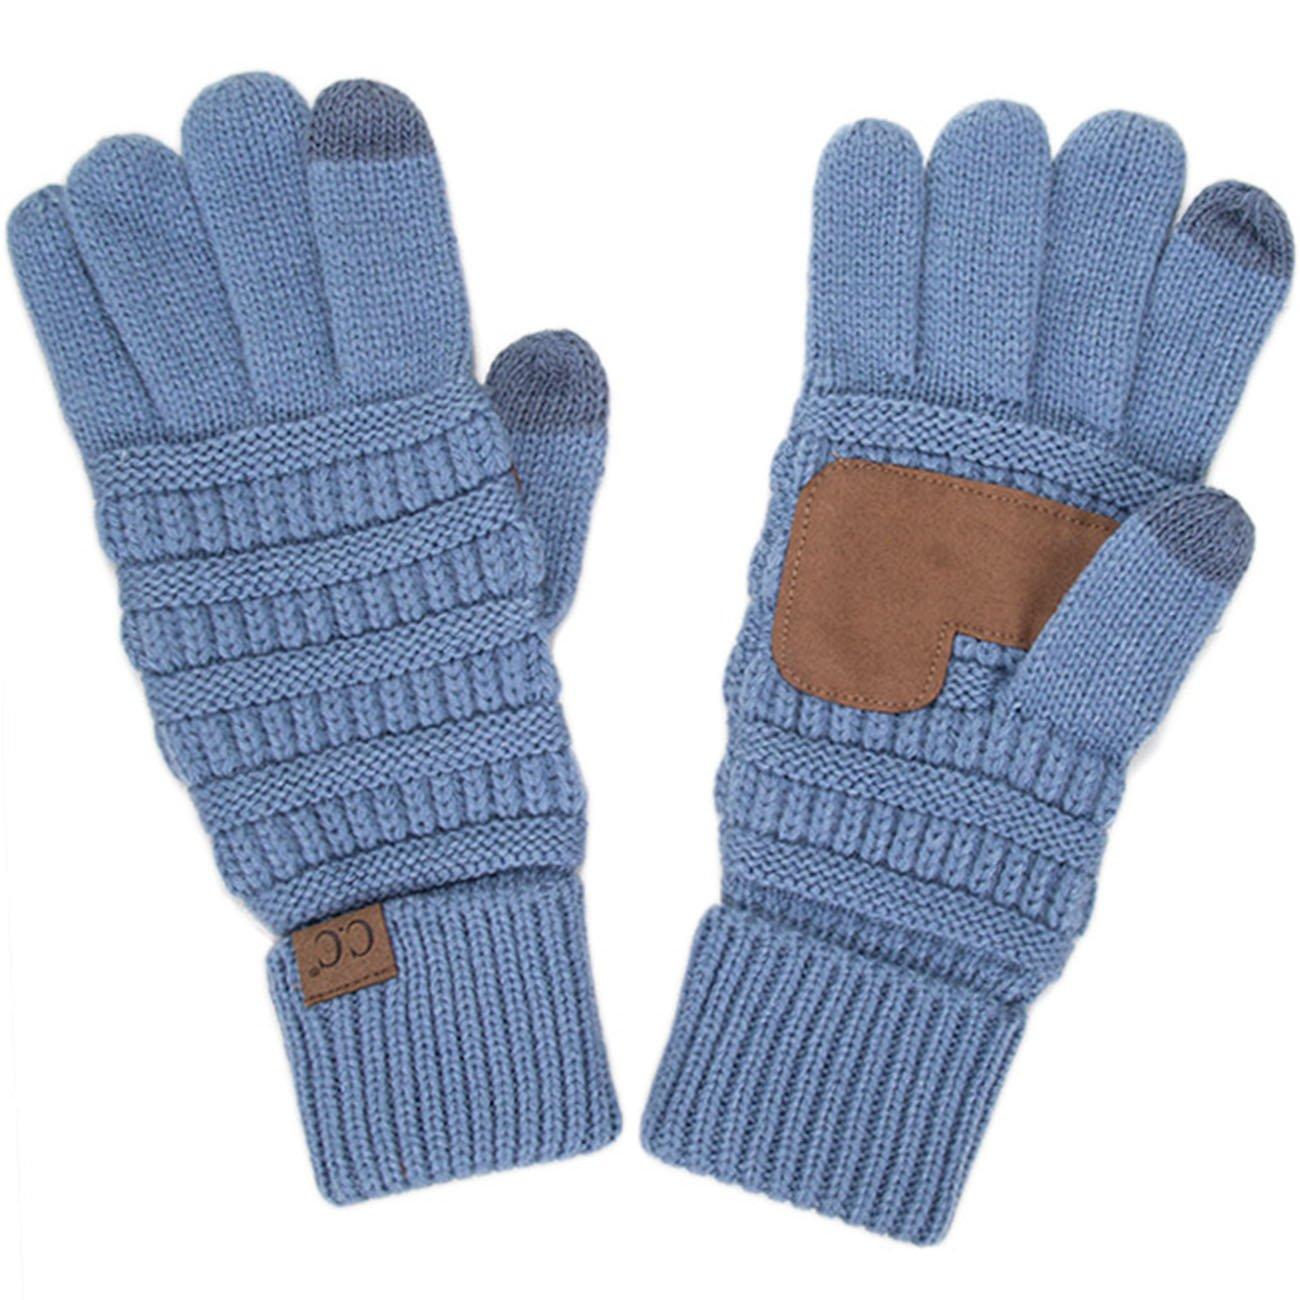 ScarvesMe CC 3pc Set Trendy Warm Chunky Soft Stretch Cable Knit Beanie Scarves Gloves Set (Denim) by ScarvesMe (Image #3)